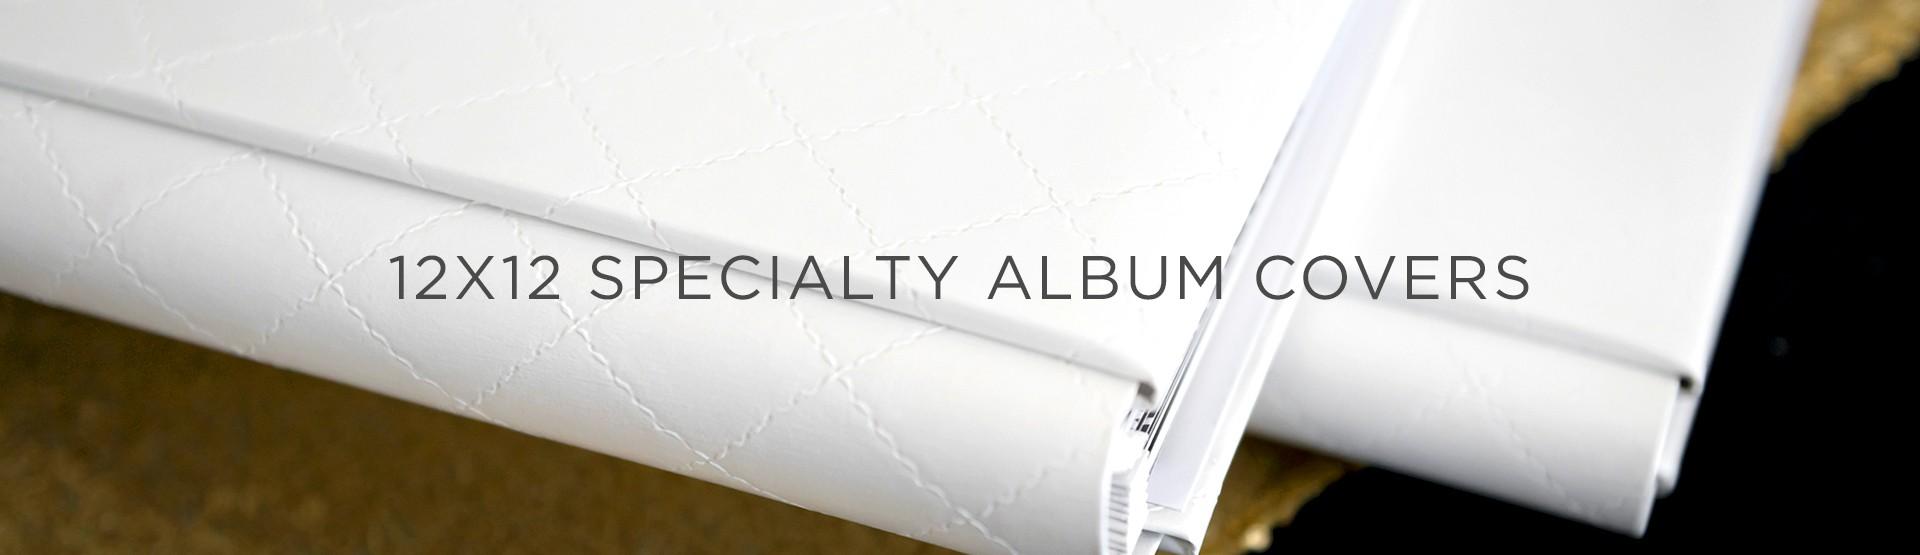 12x12 Specialty Album Covers